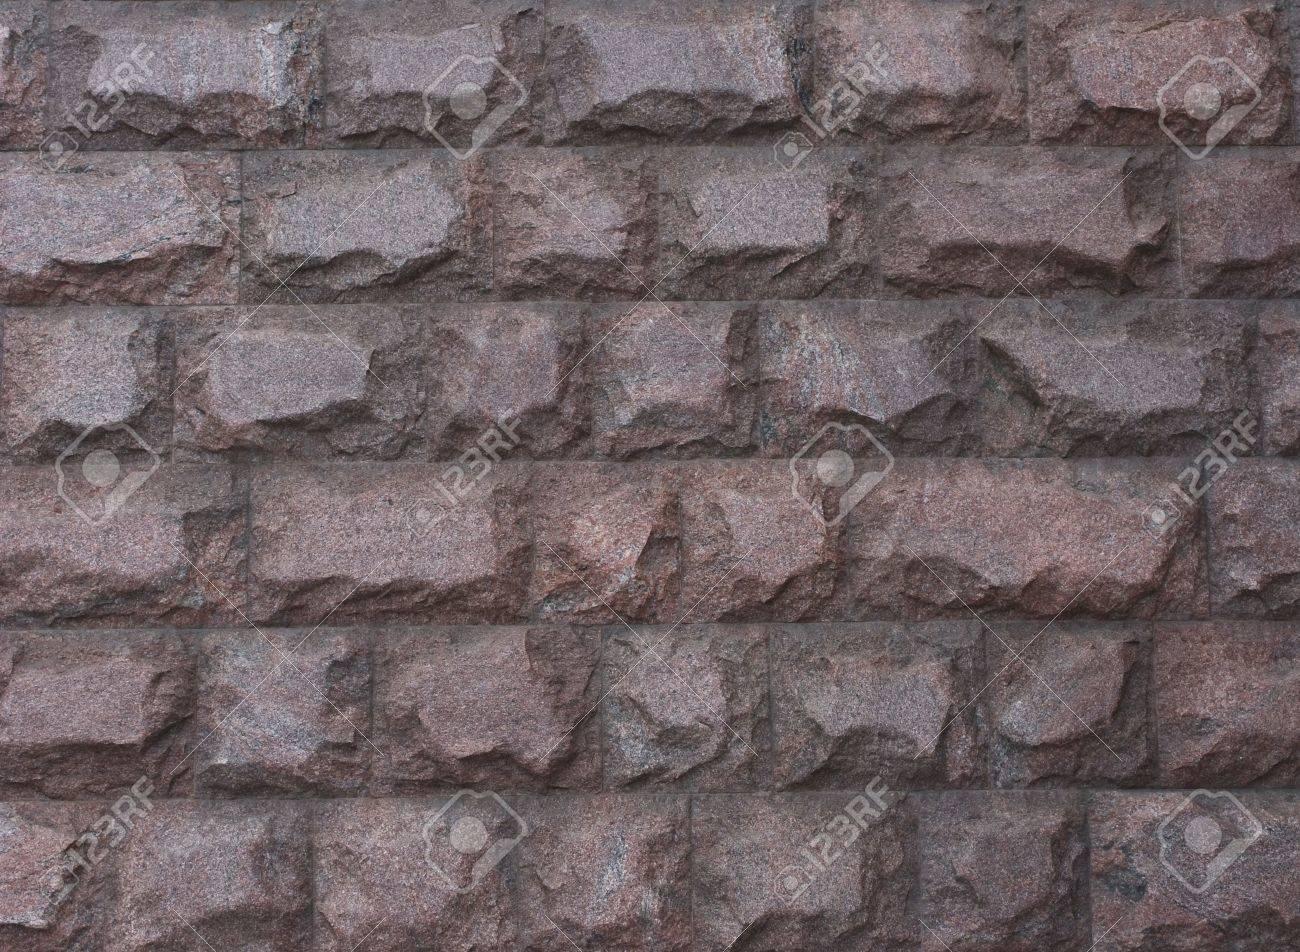 Rough Granite Blocks Rough Granite Stone Blocks